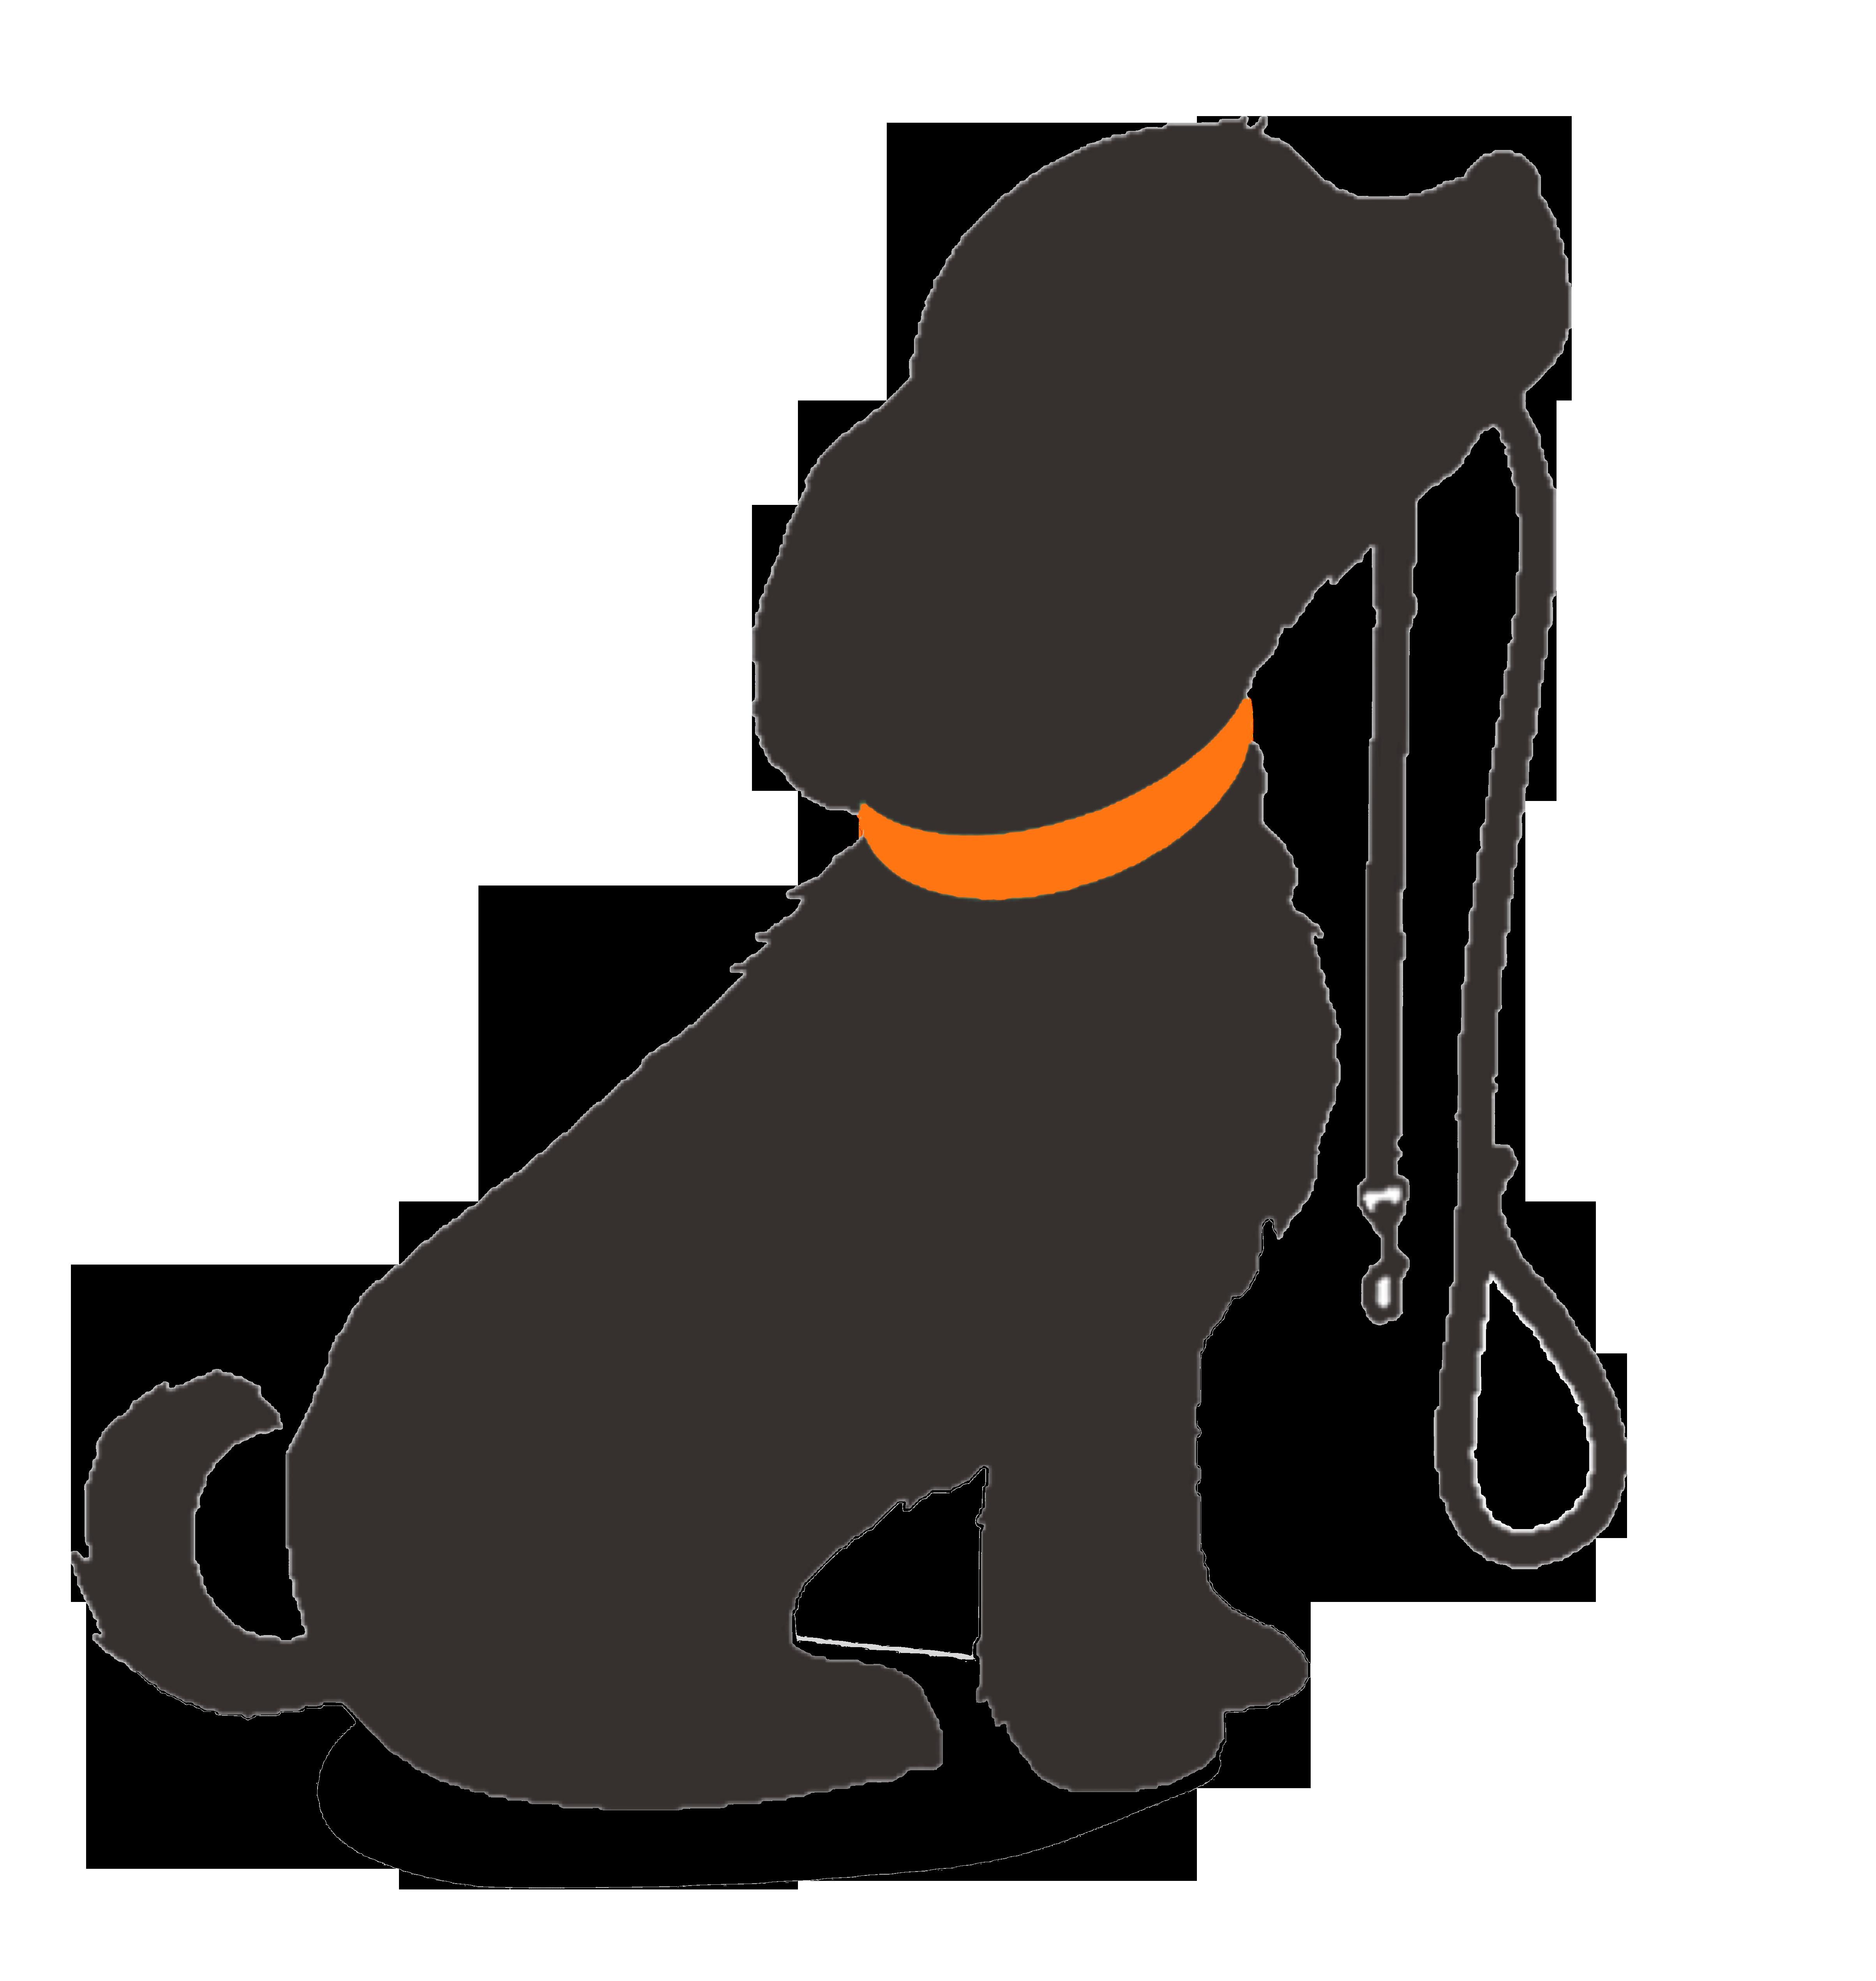 Dog Obedience Training Walking On A Leash